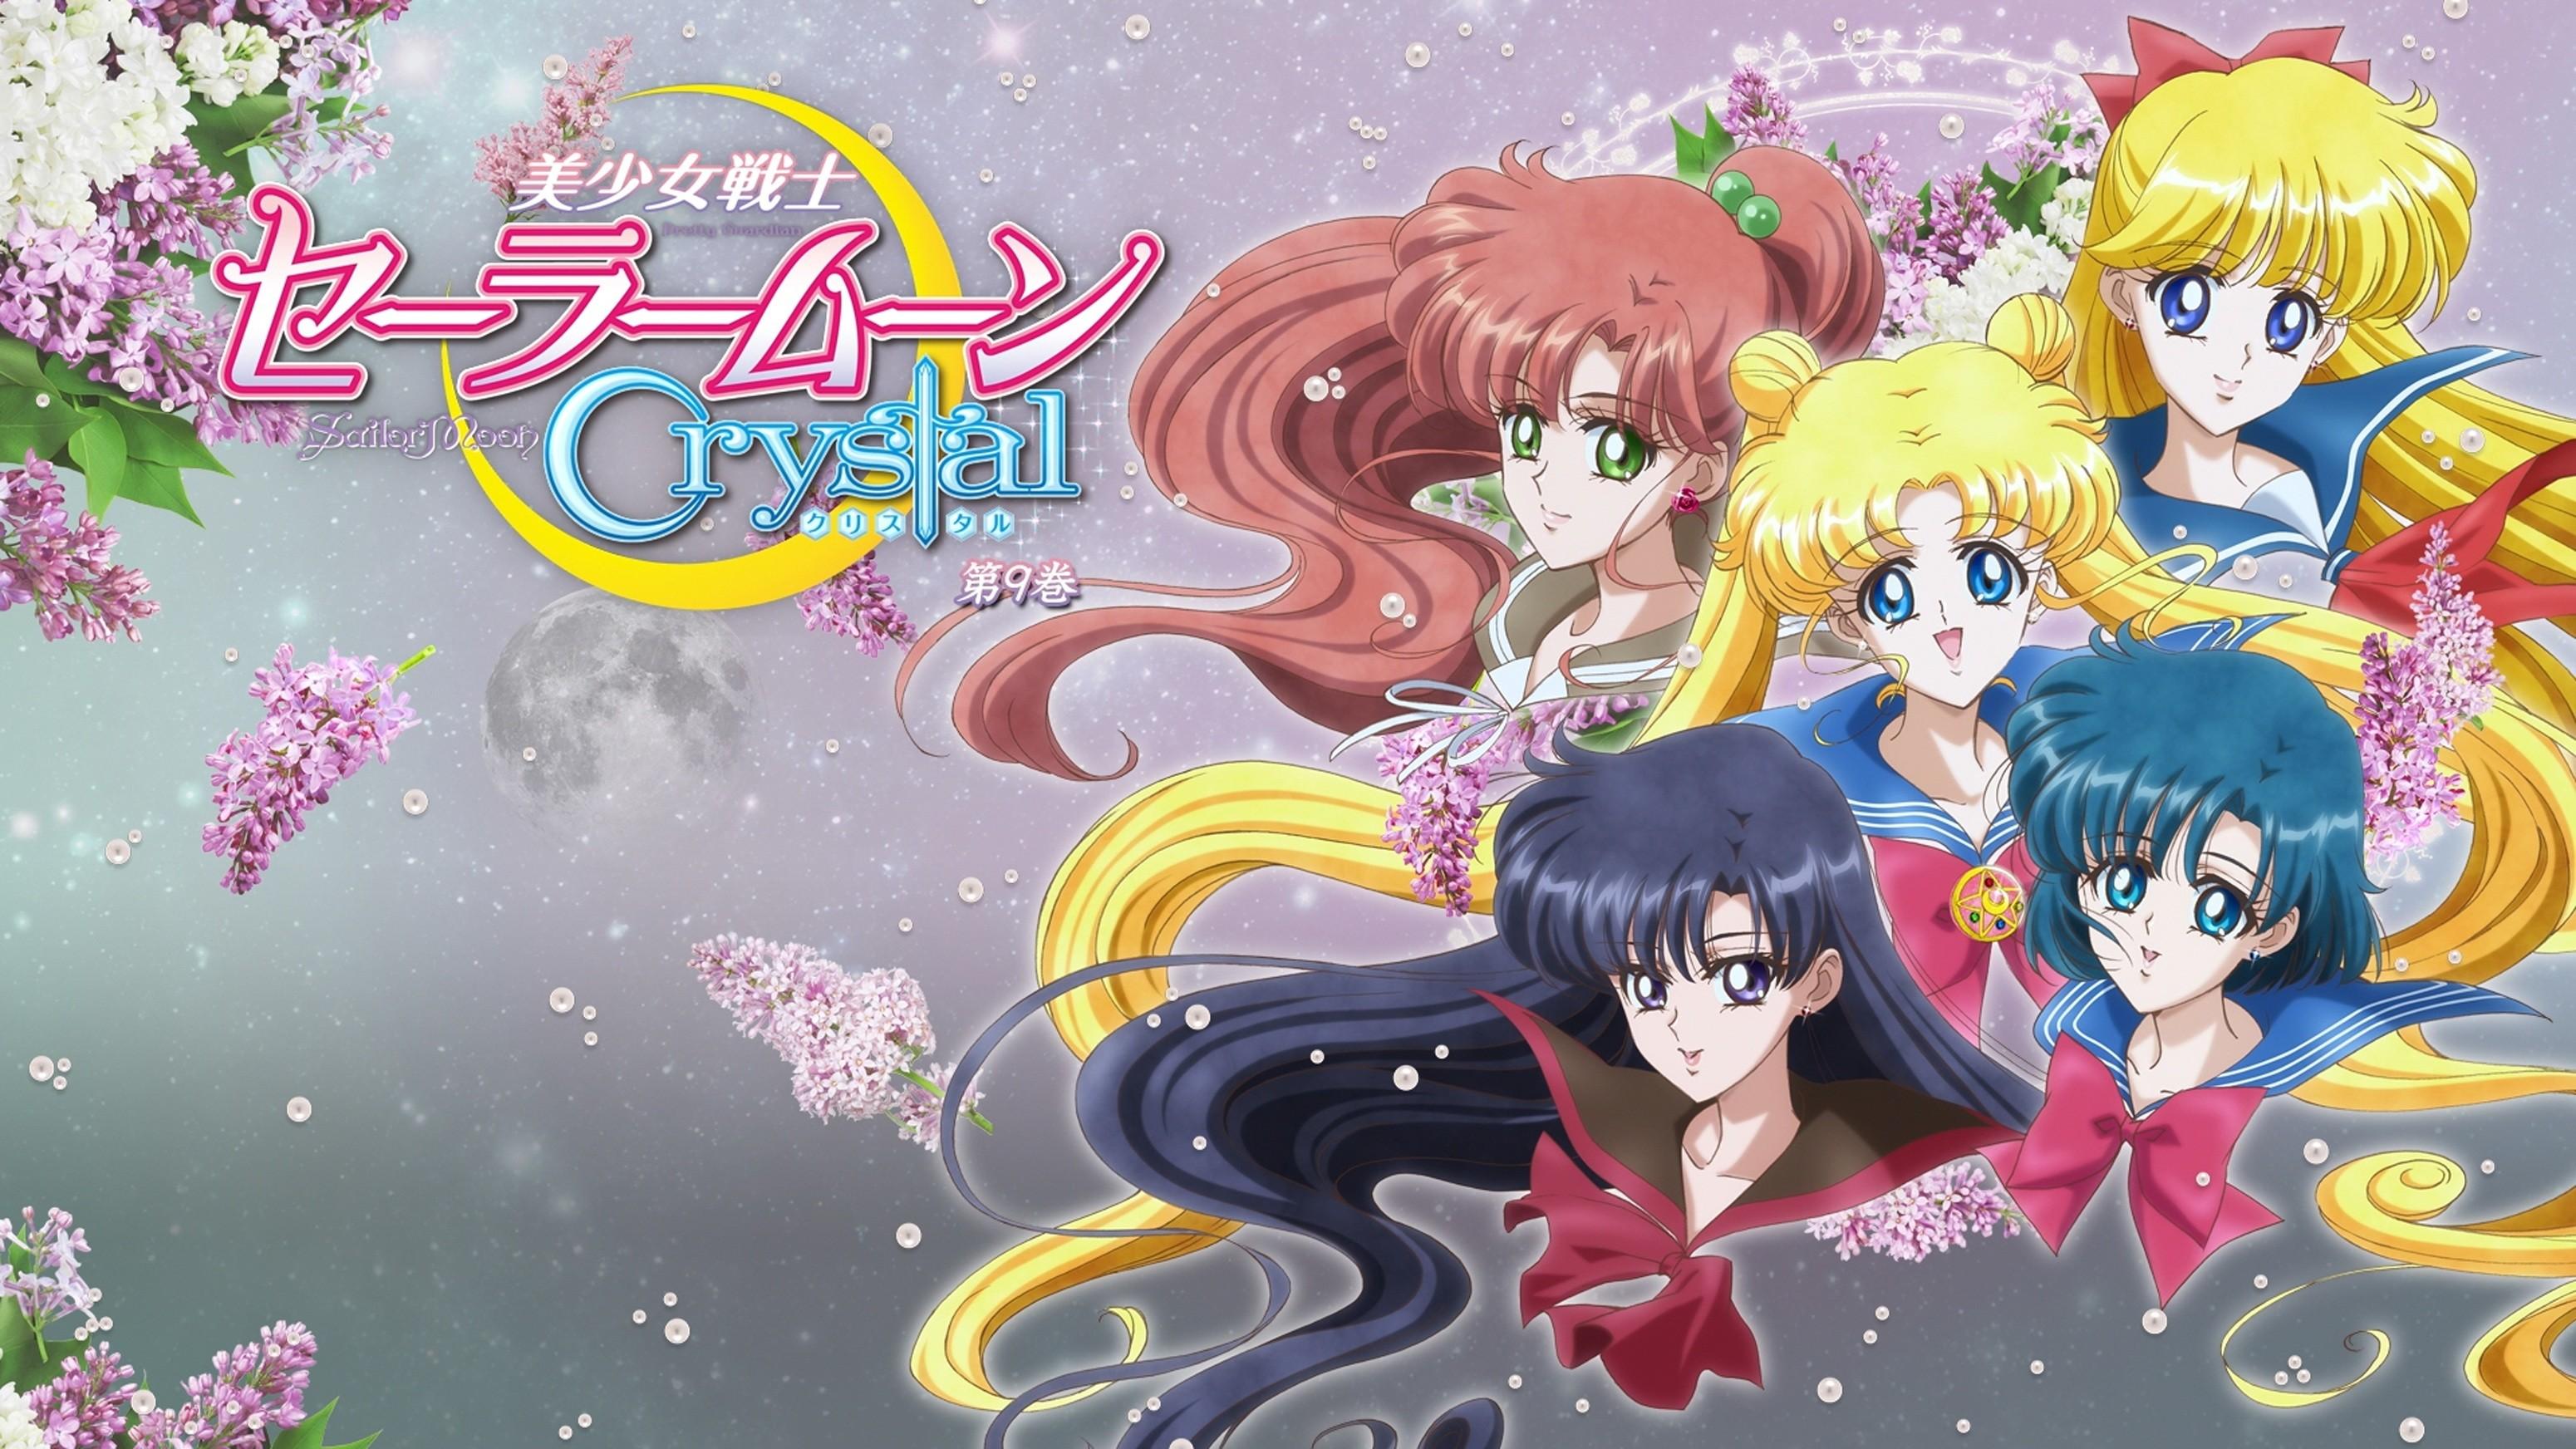 Wallpaper HD Sailor Moon Crystal DVD 9